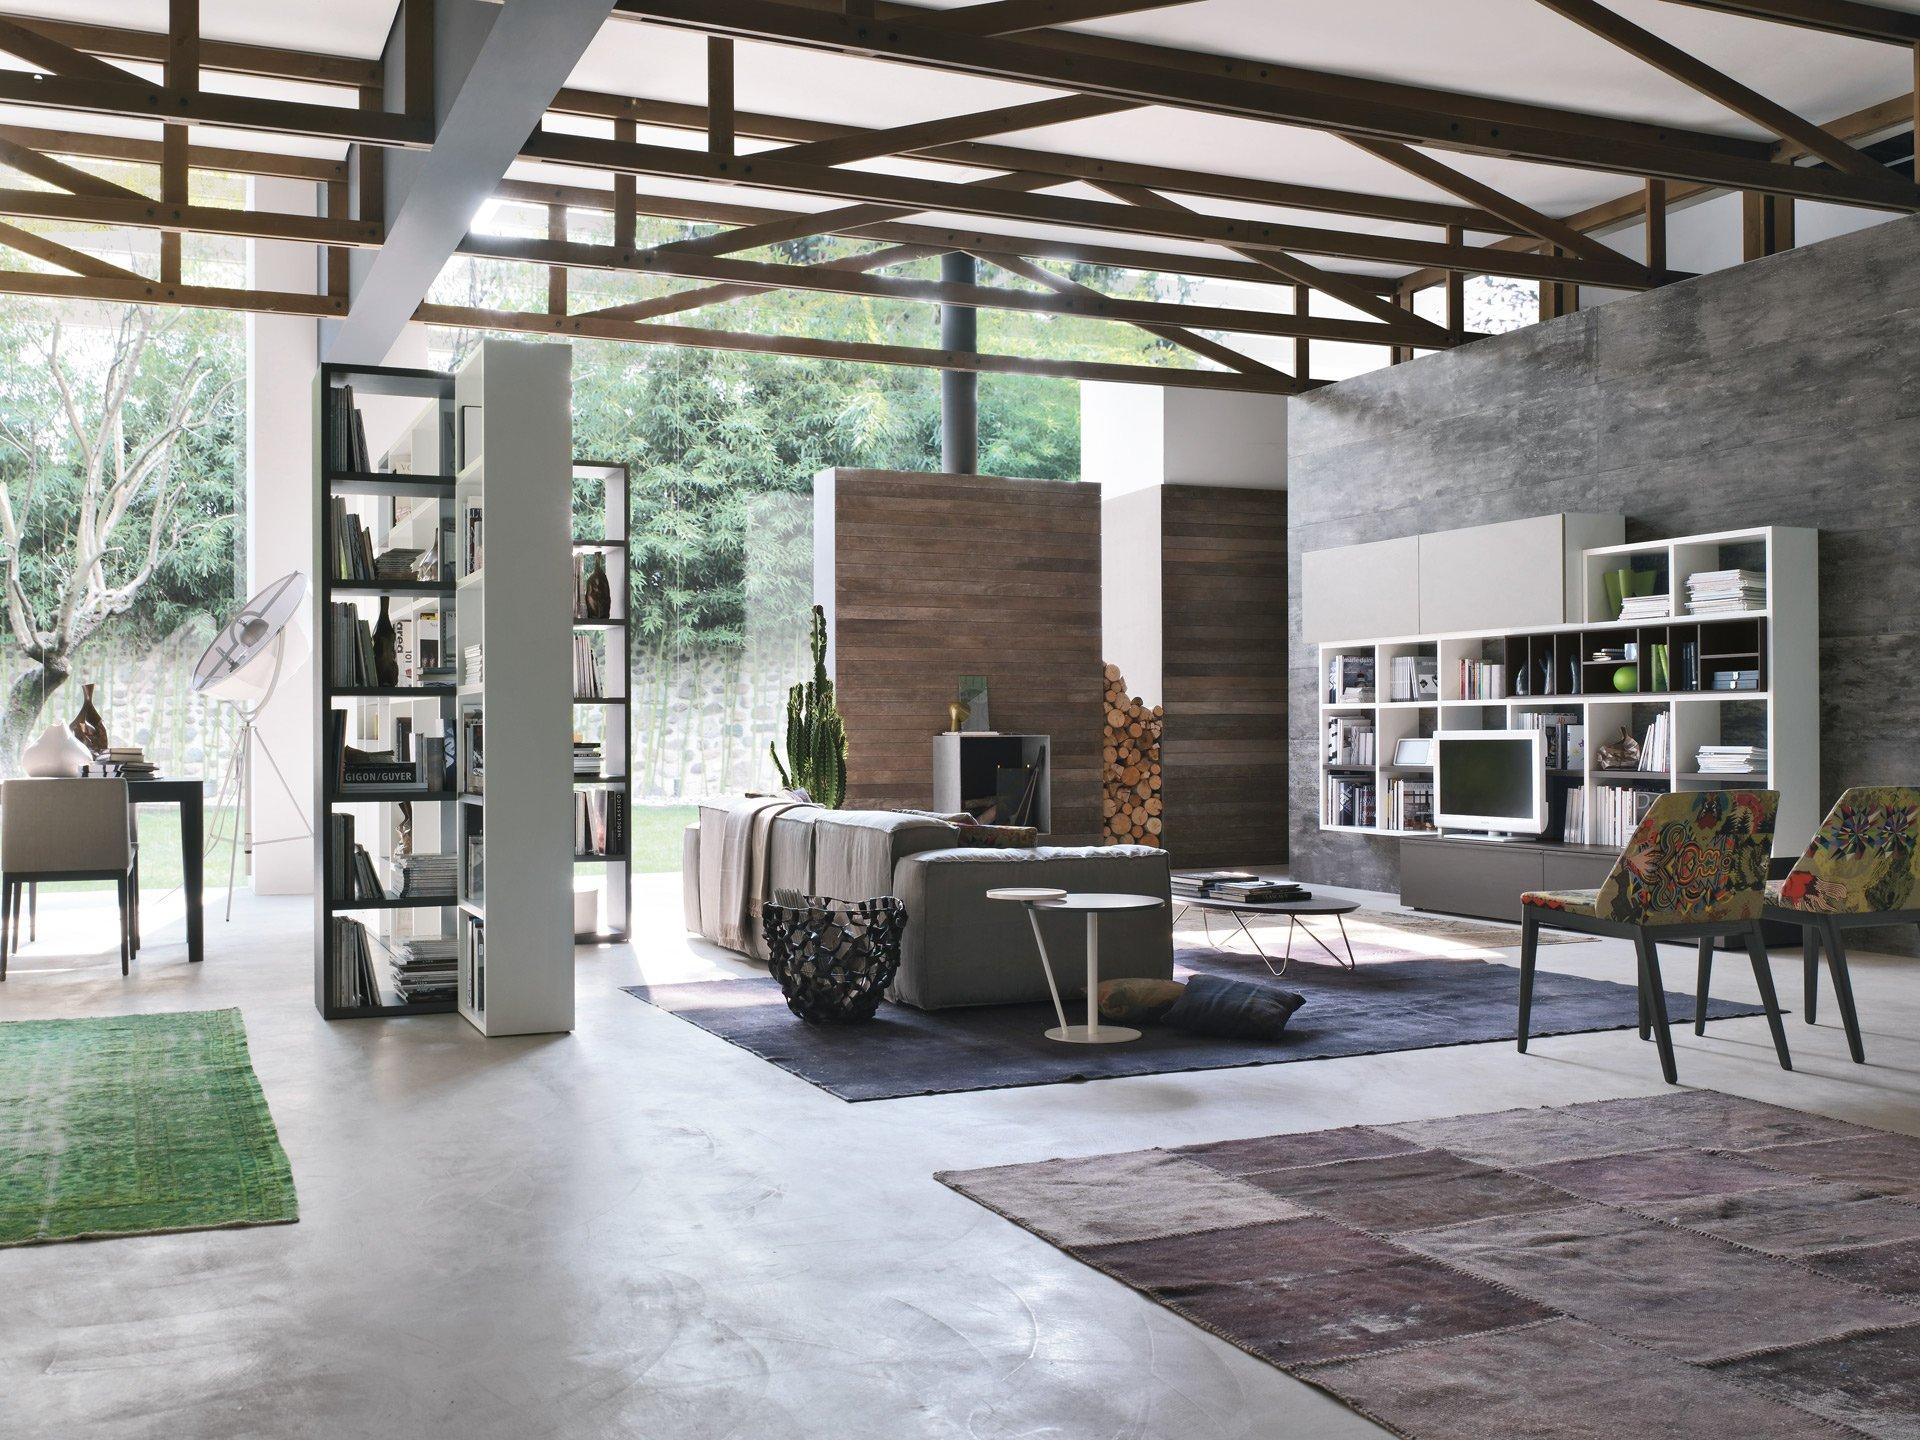 Коричнево-серый интерьер в стиле конструктивизм